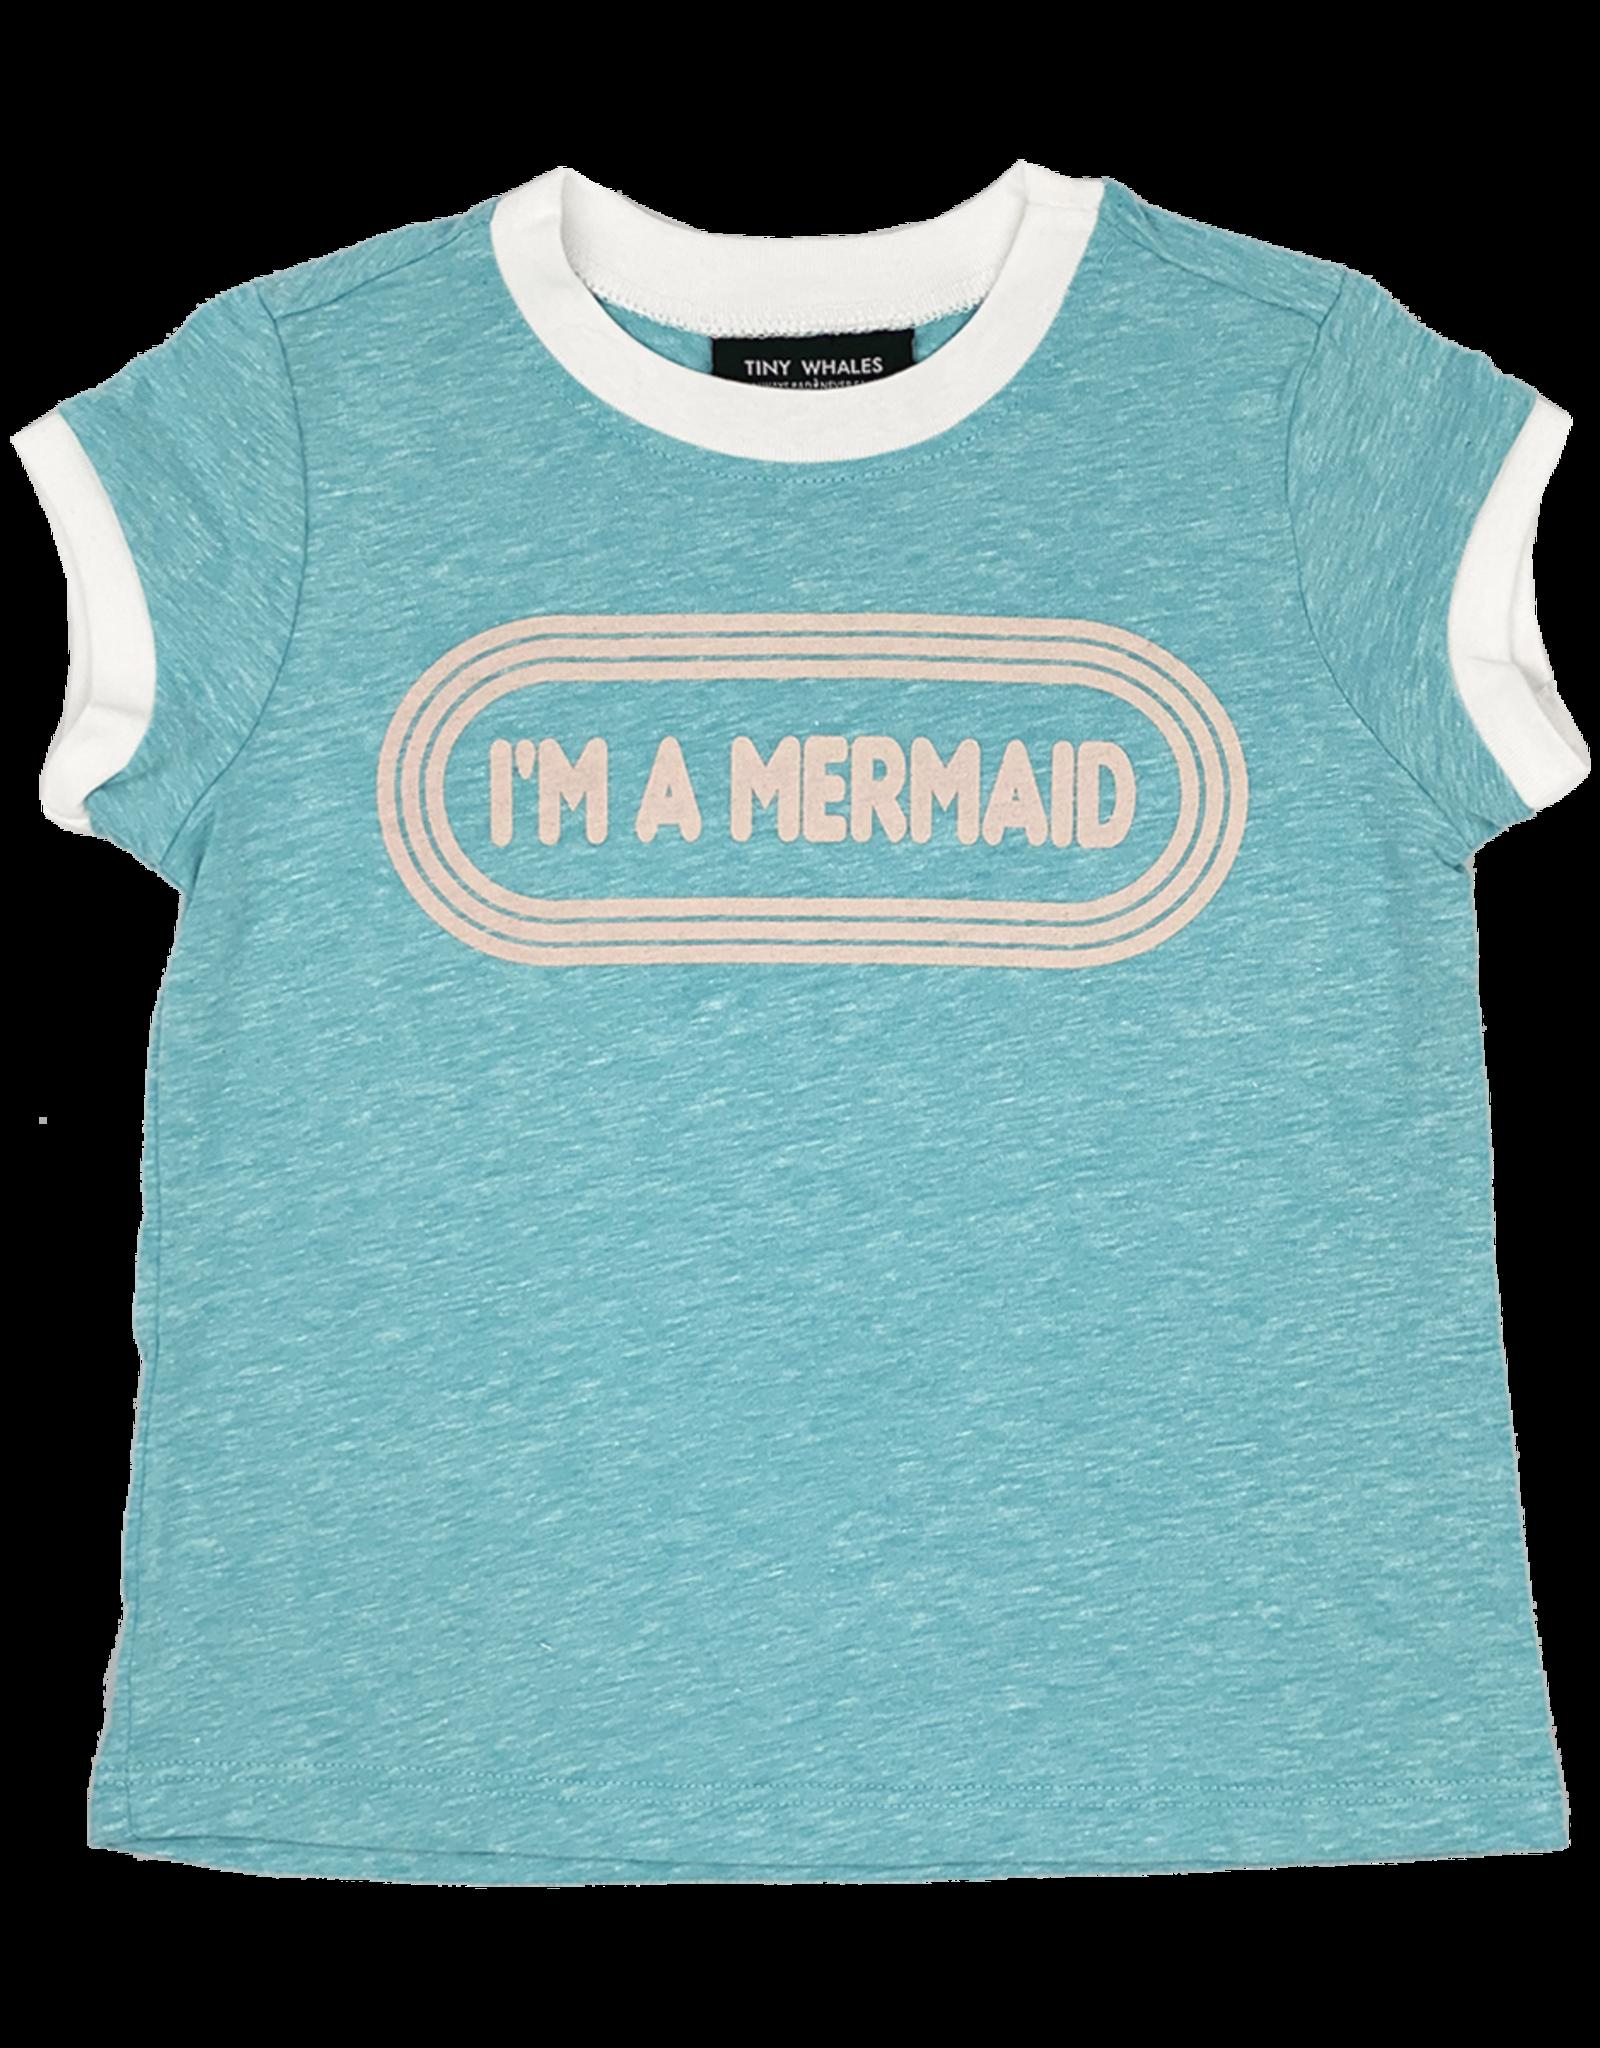 Tiny Whales Tiny Whales I'm a Mermaid Tee